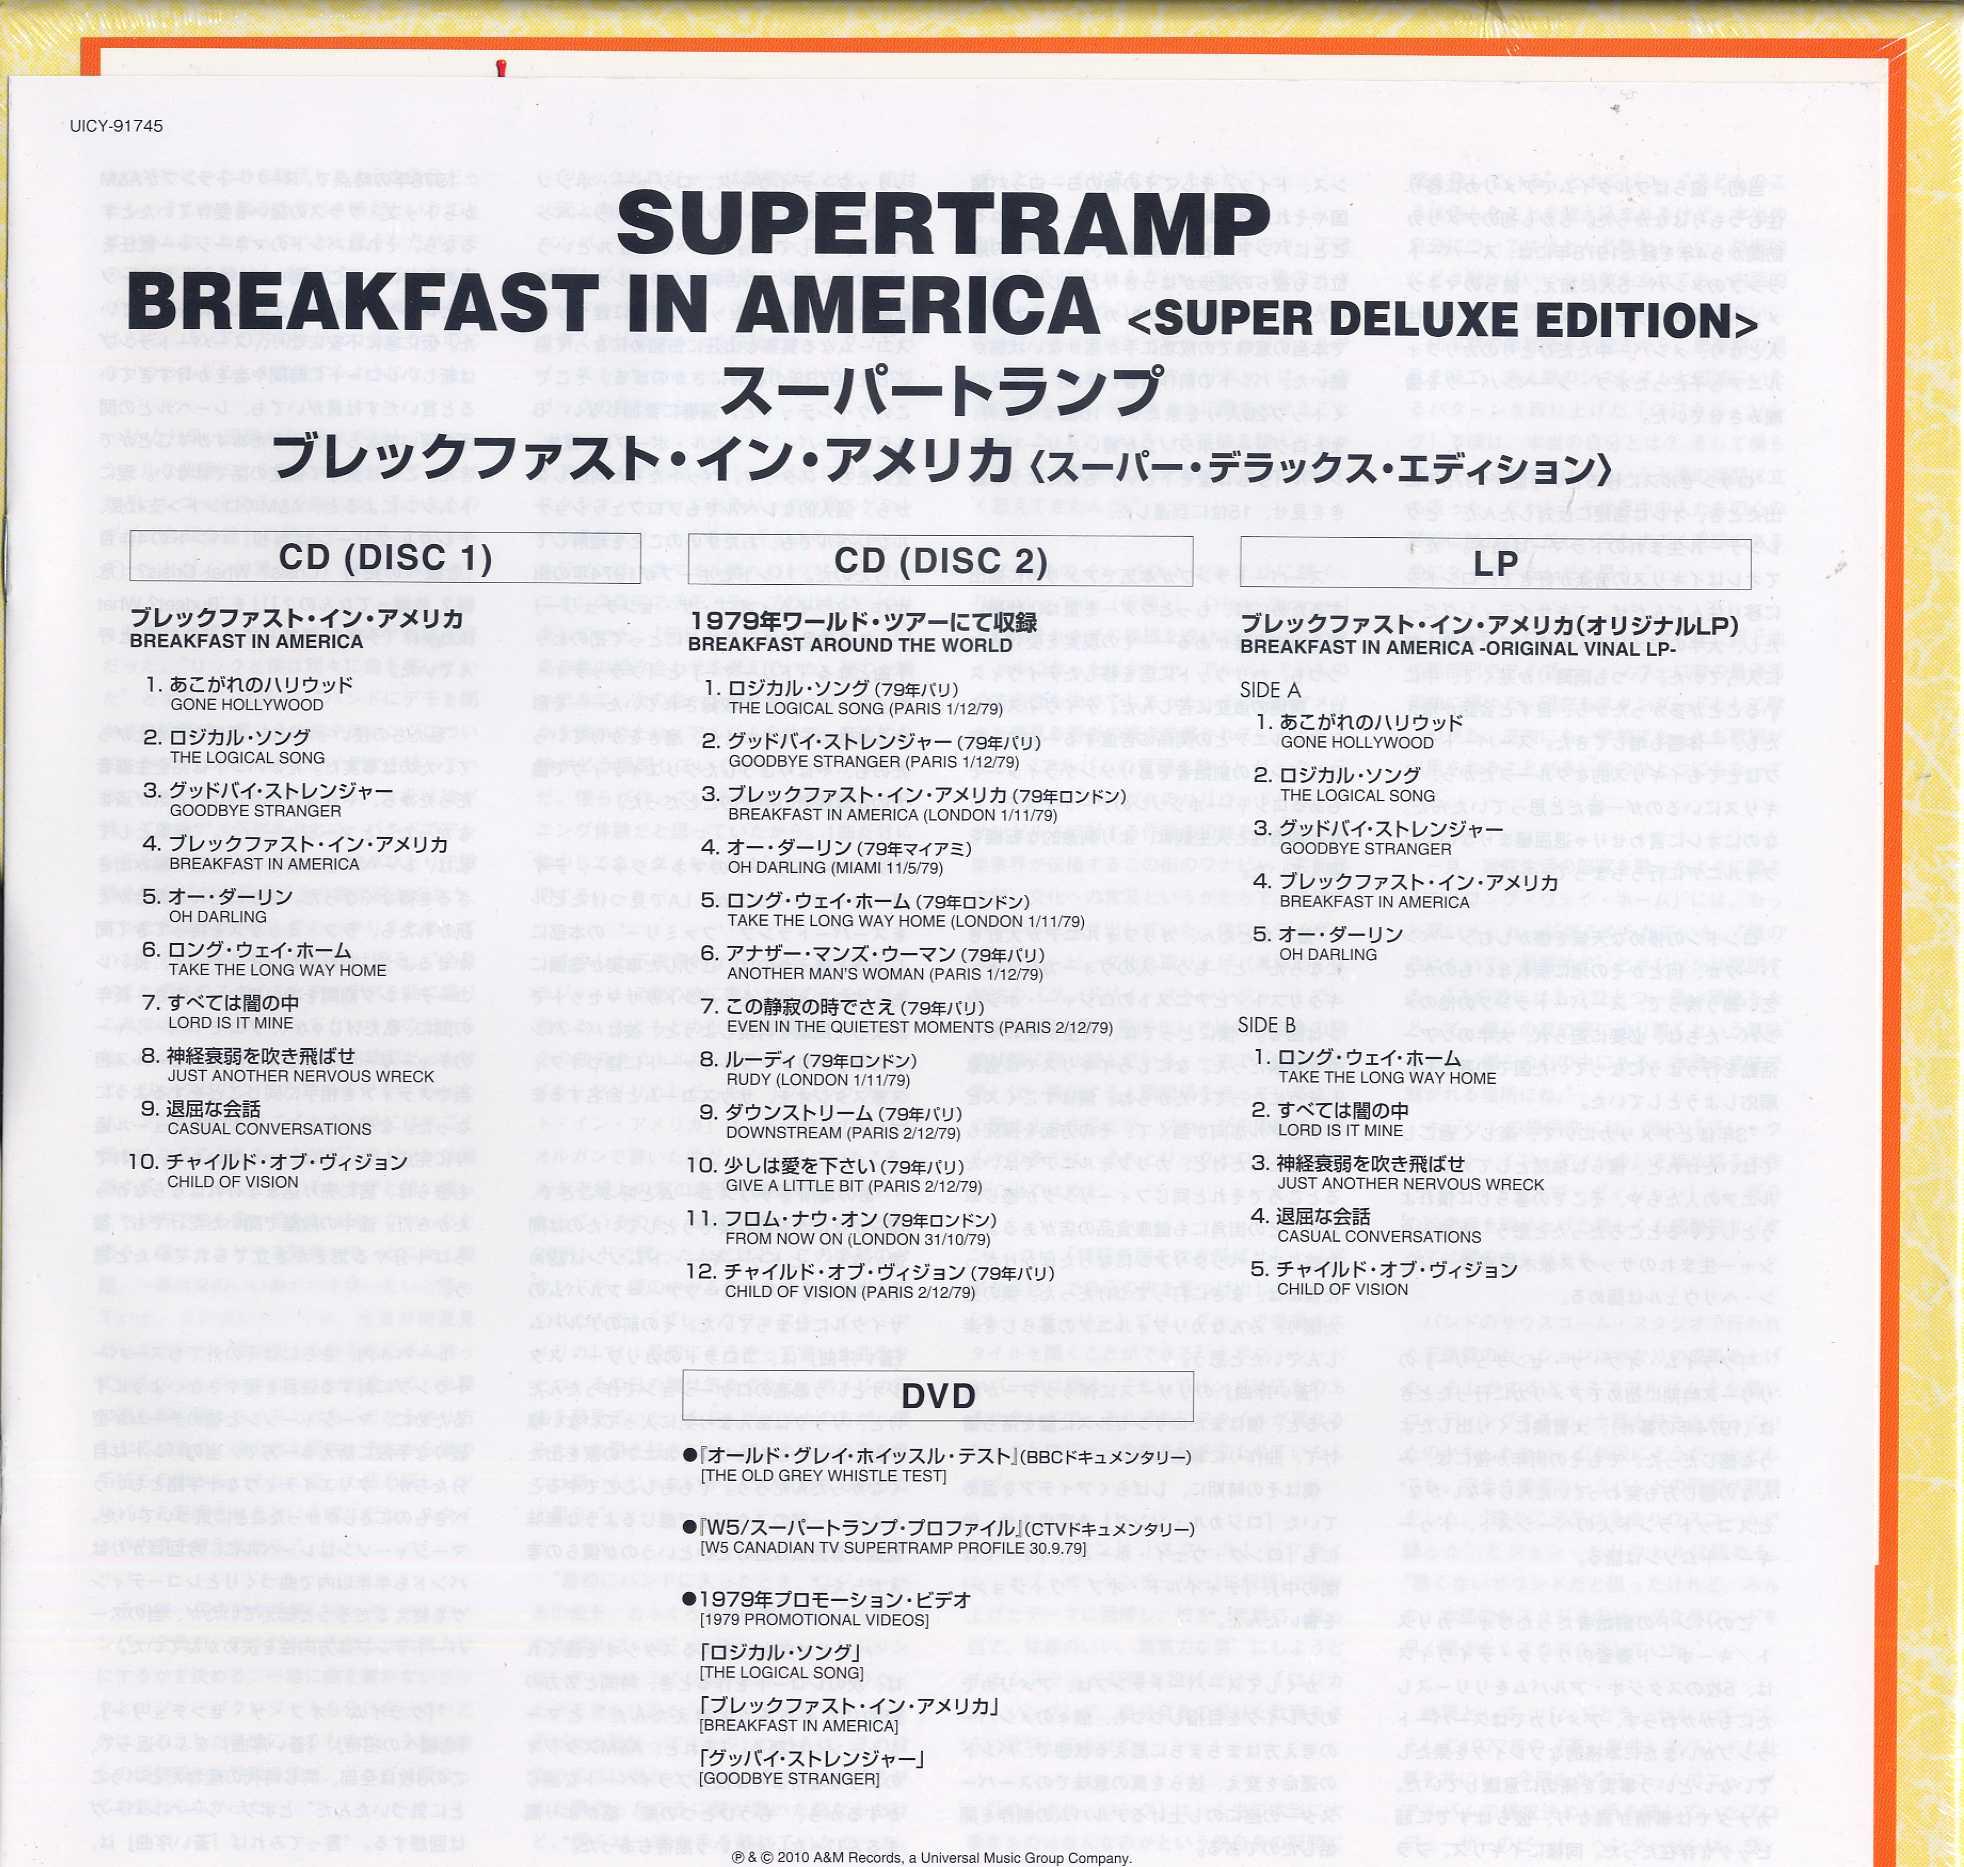 Supertramp Breakfast In America Super Deluxe Edition Shm